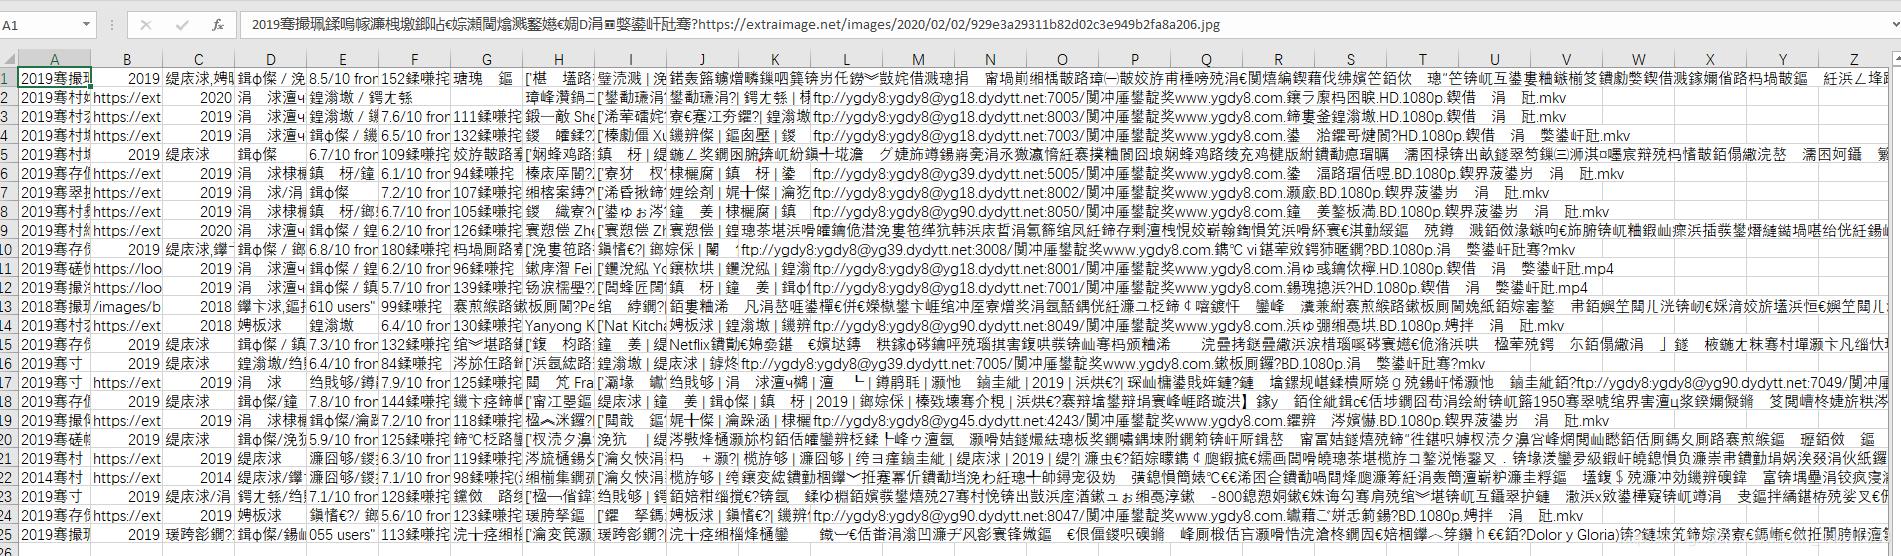 csv文件中文乱码